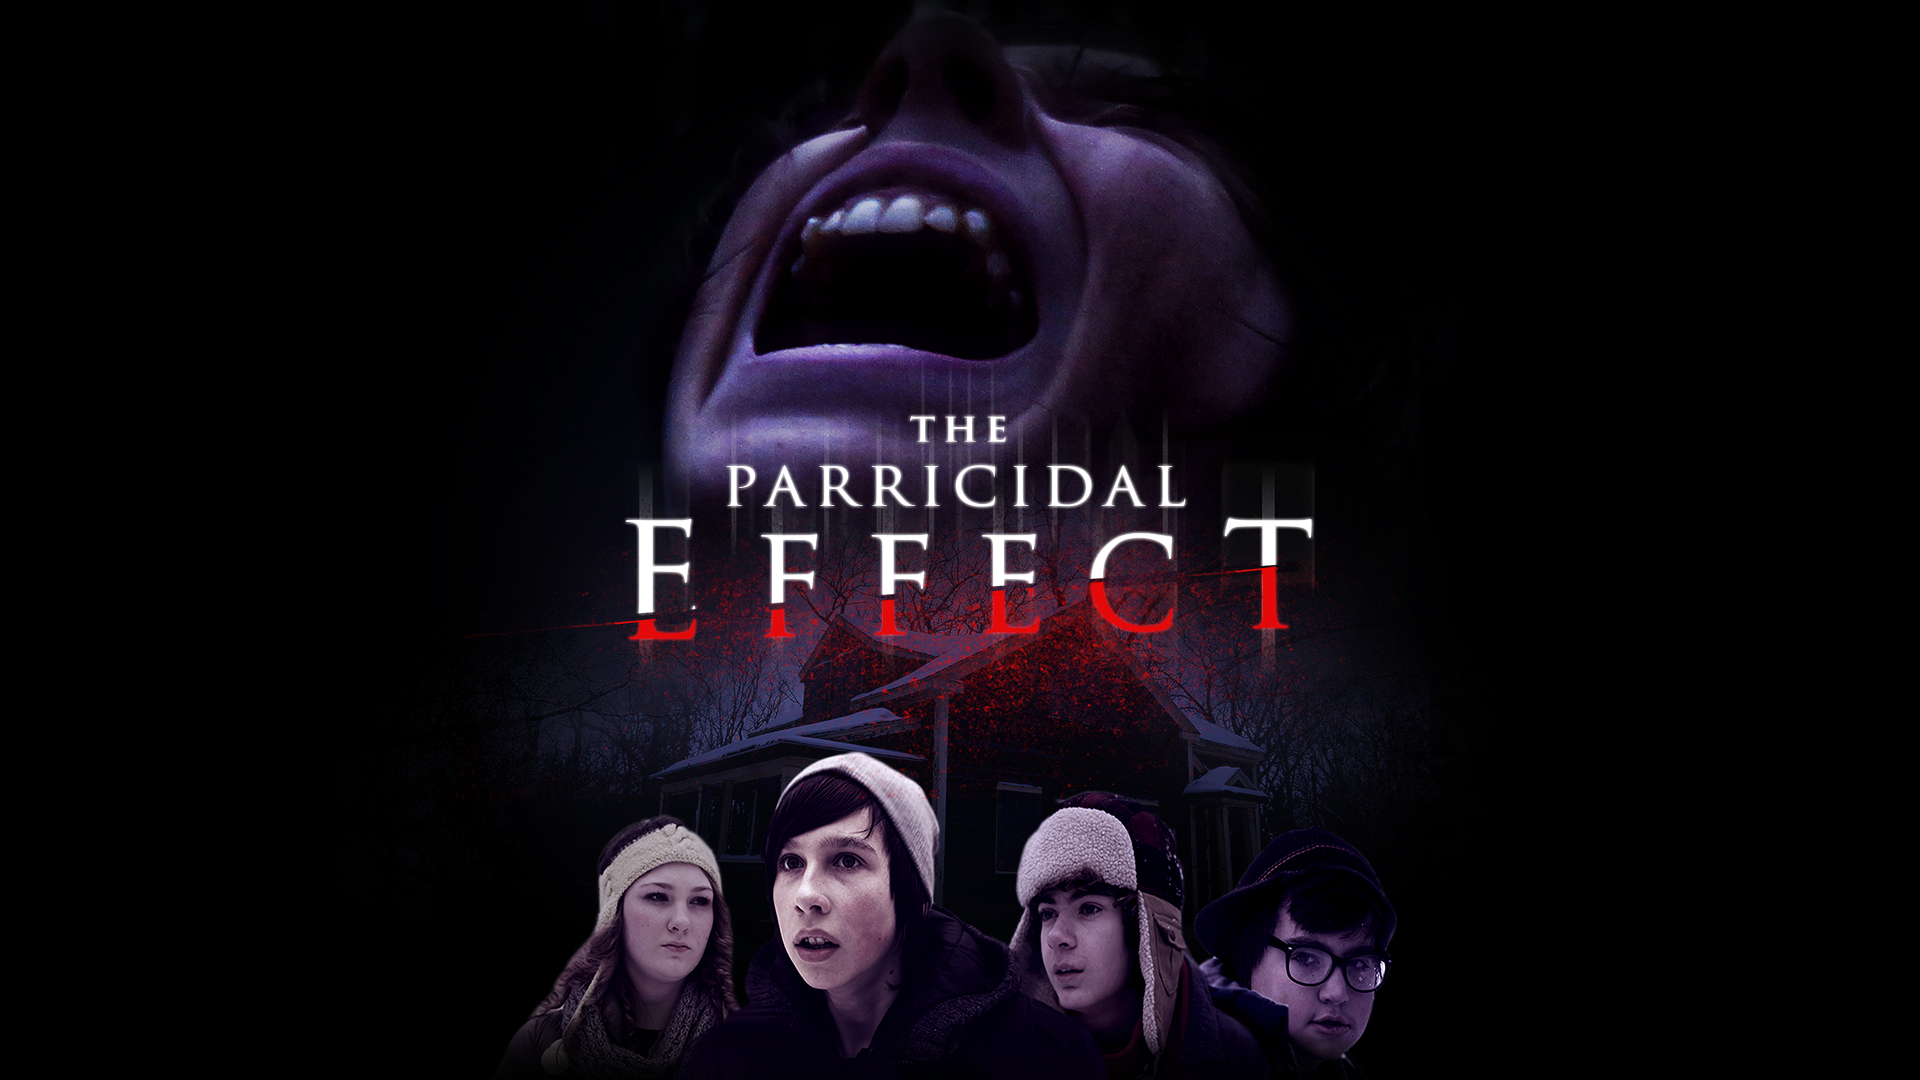 The Parricidal Effect